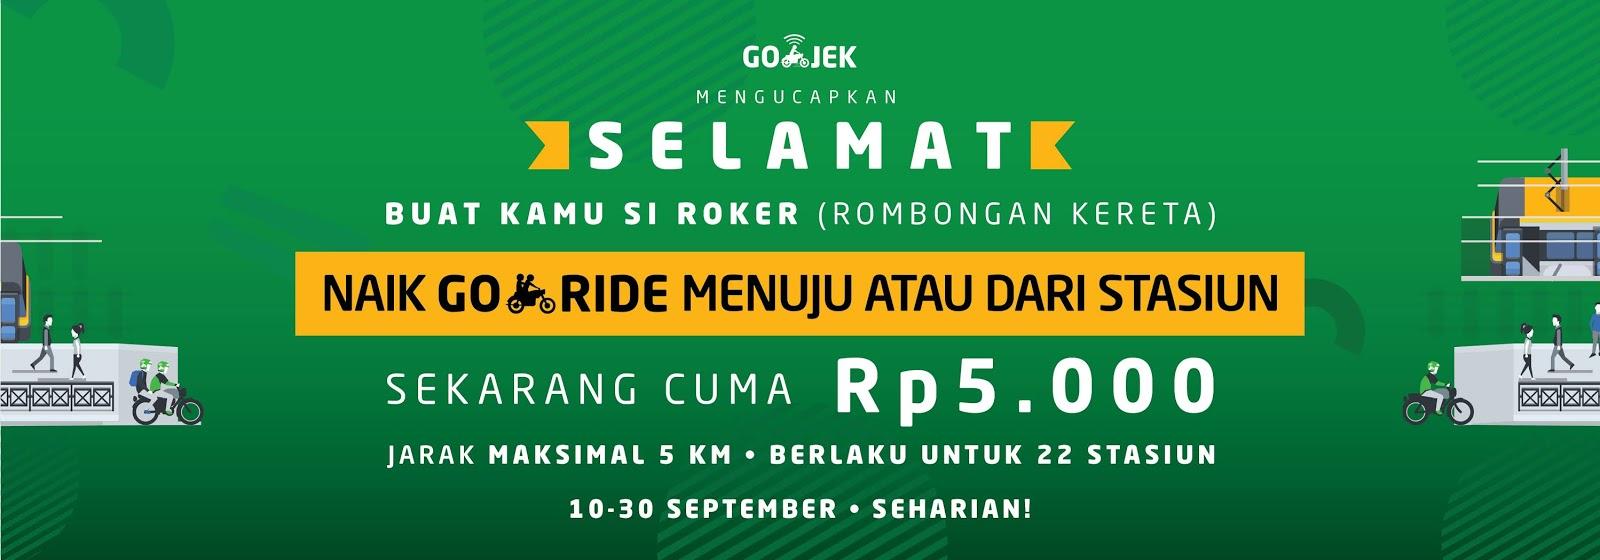 GOJEK - Promo Flat Dare Cuma 5 Ribu Ke 22 Stasuin Jabodetabek (s.d 30 Sept 2018)